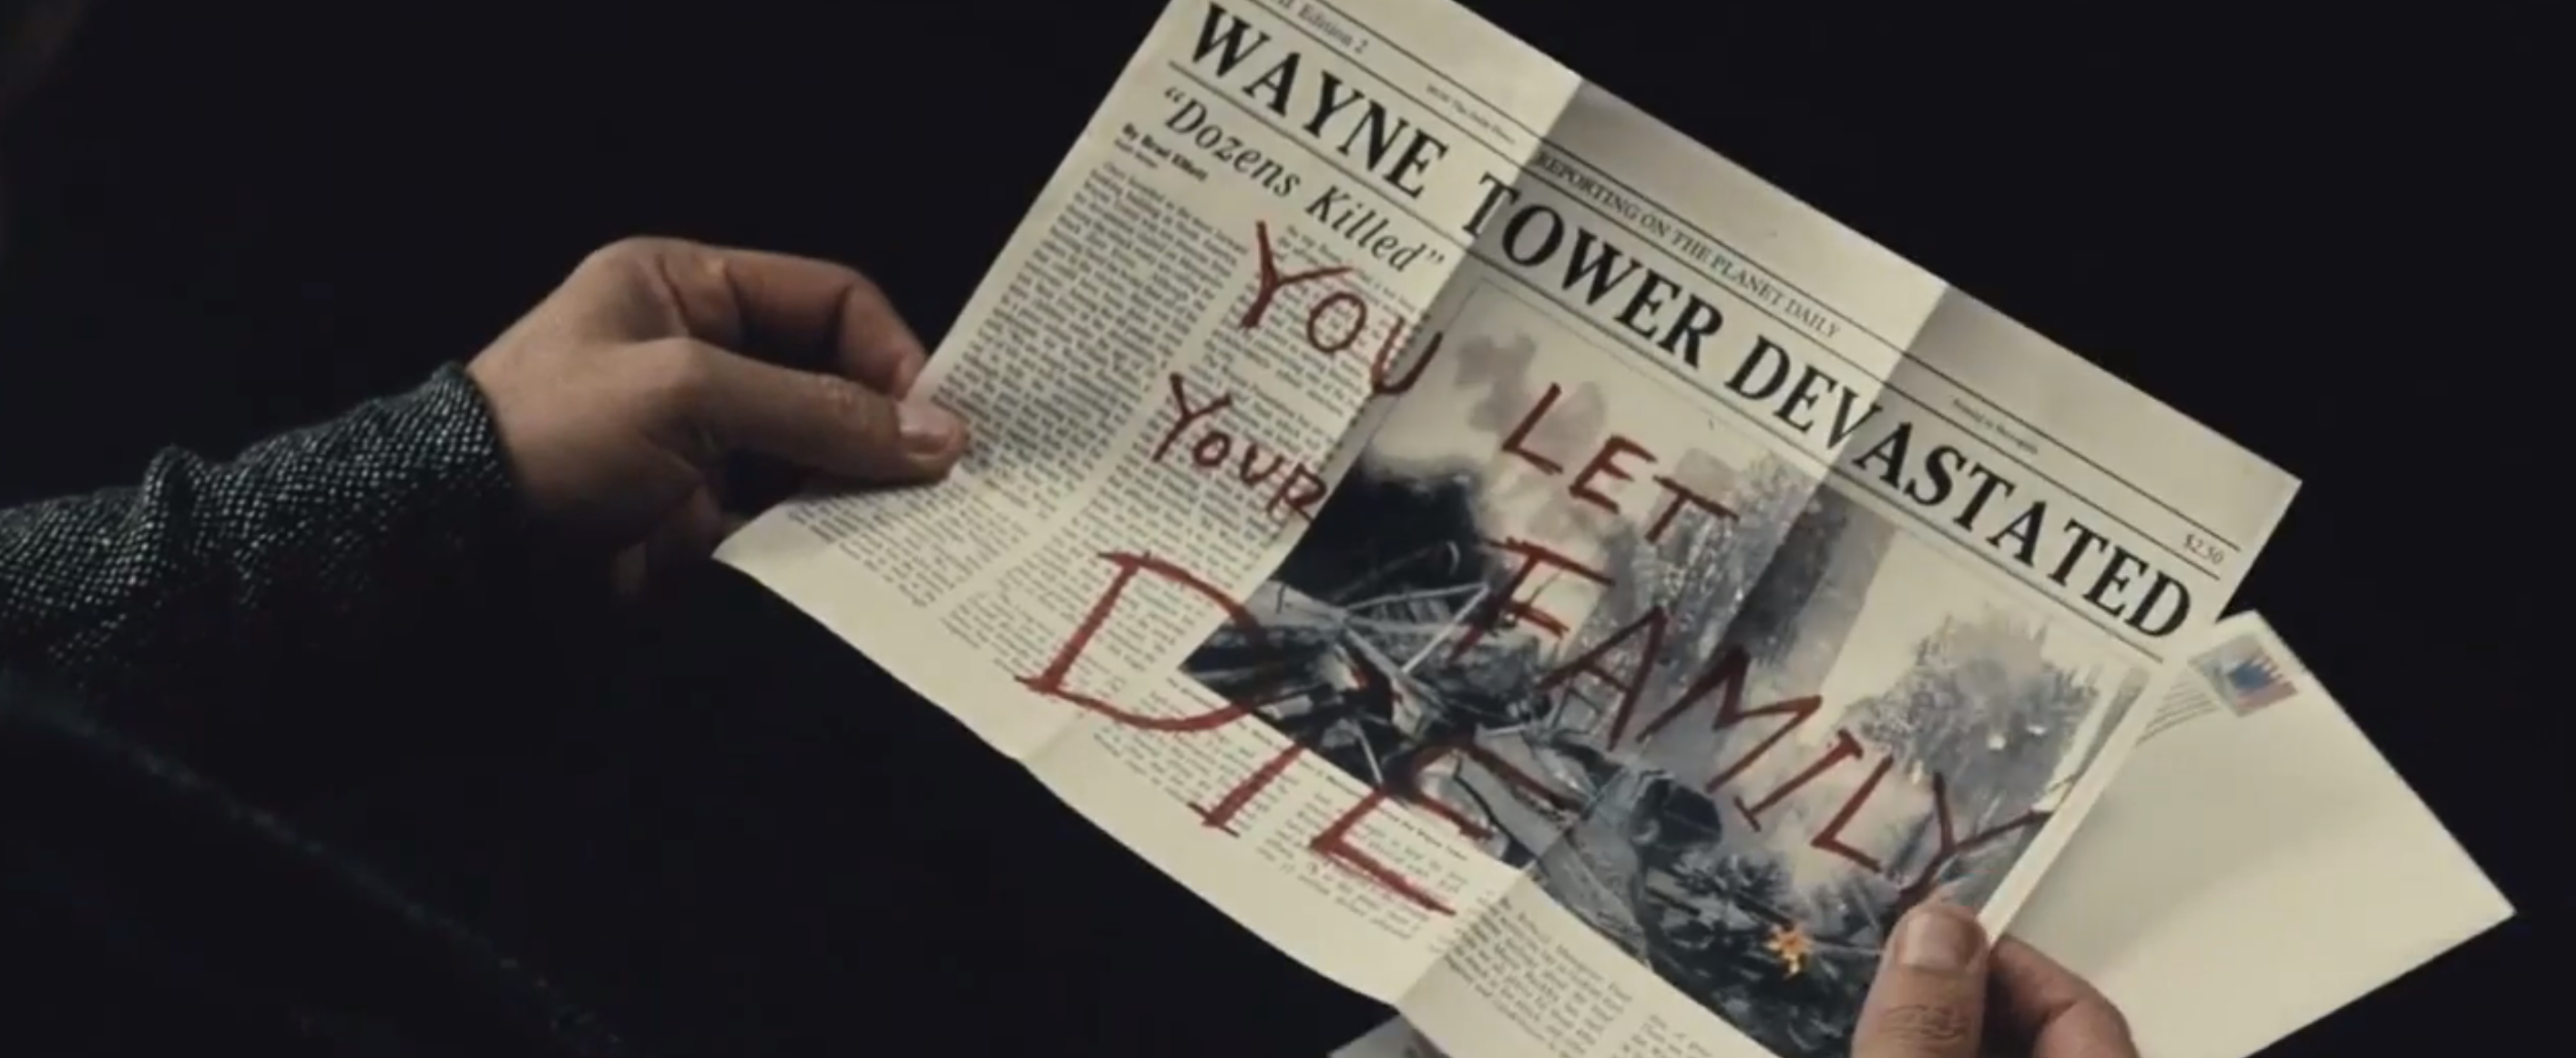 batman-v-superman-you-let-your-family-die.png